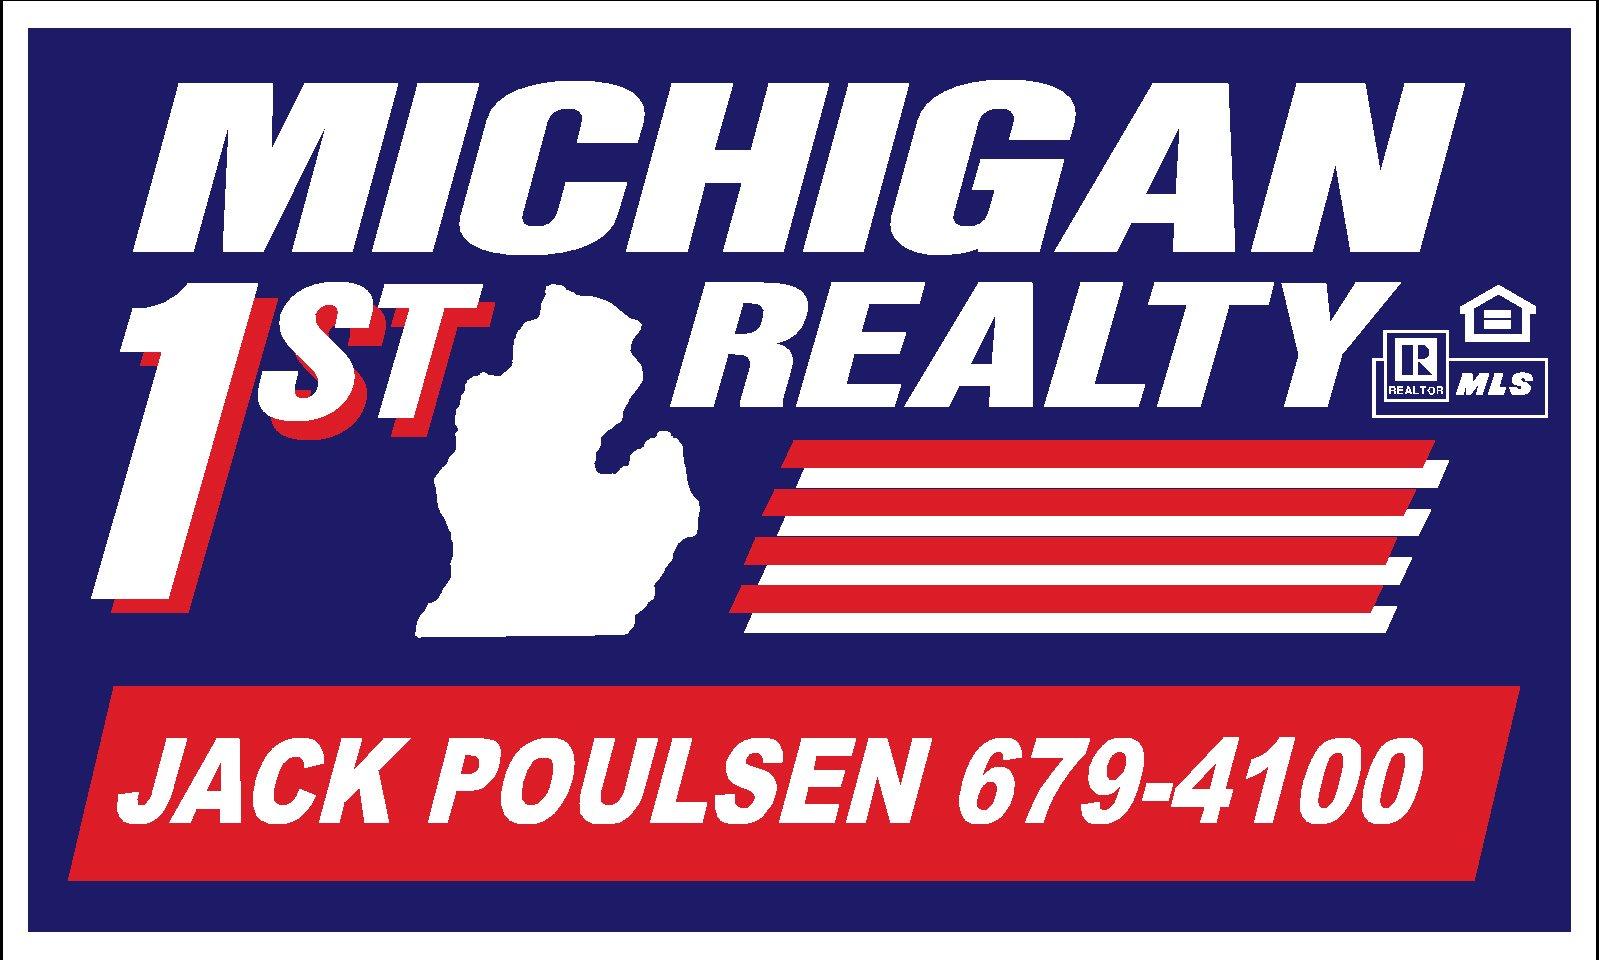 Michigan 1st Realty